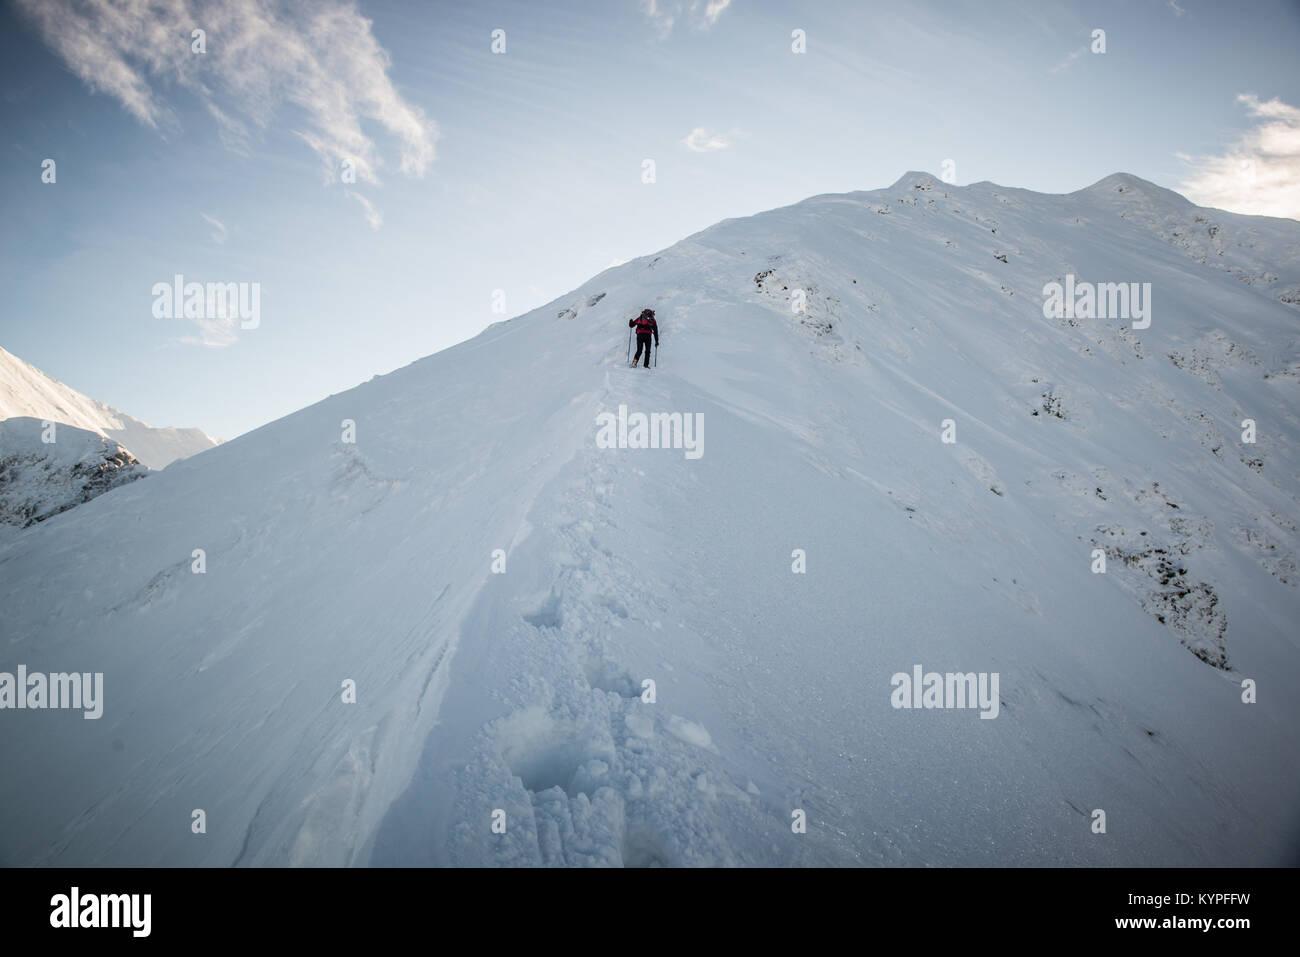 Winter, Tourist in Mountains, Stock Photo